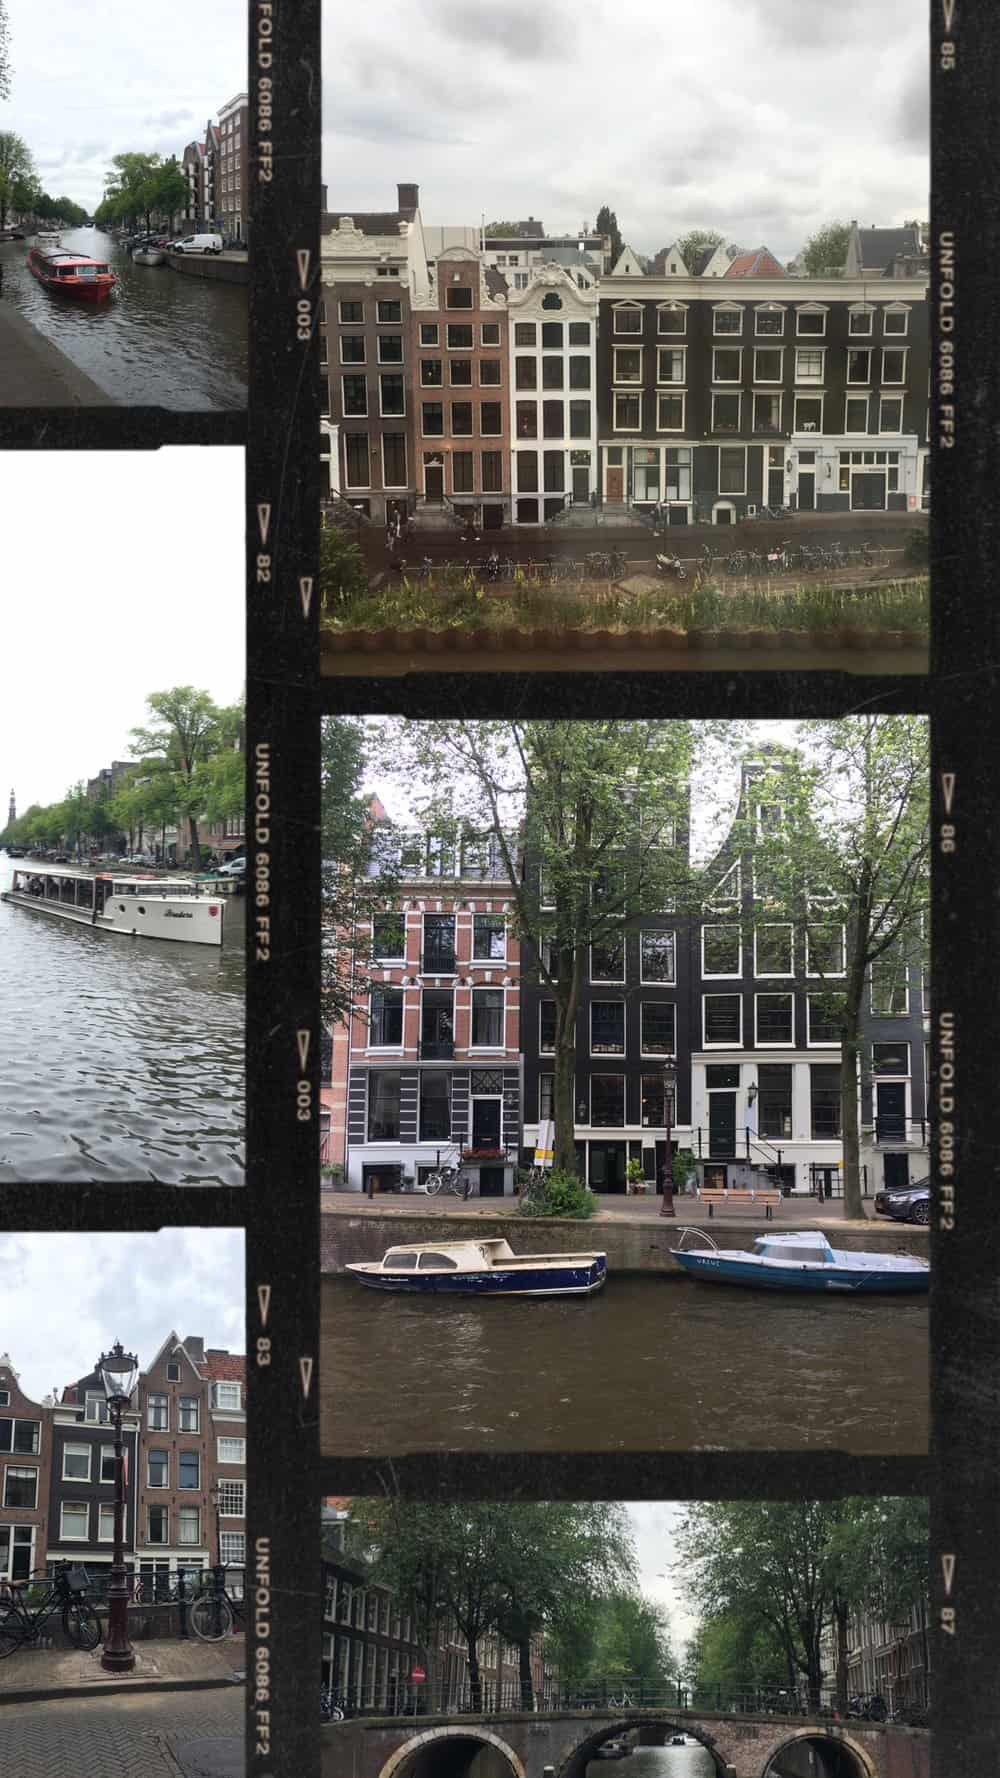 amsterdam summer 2019